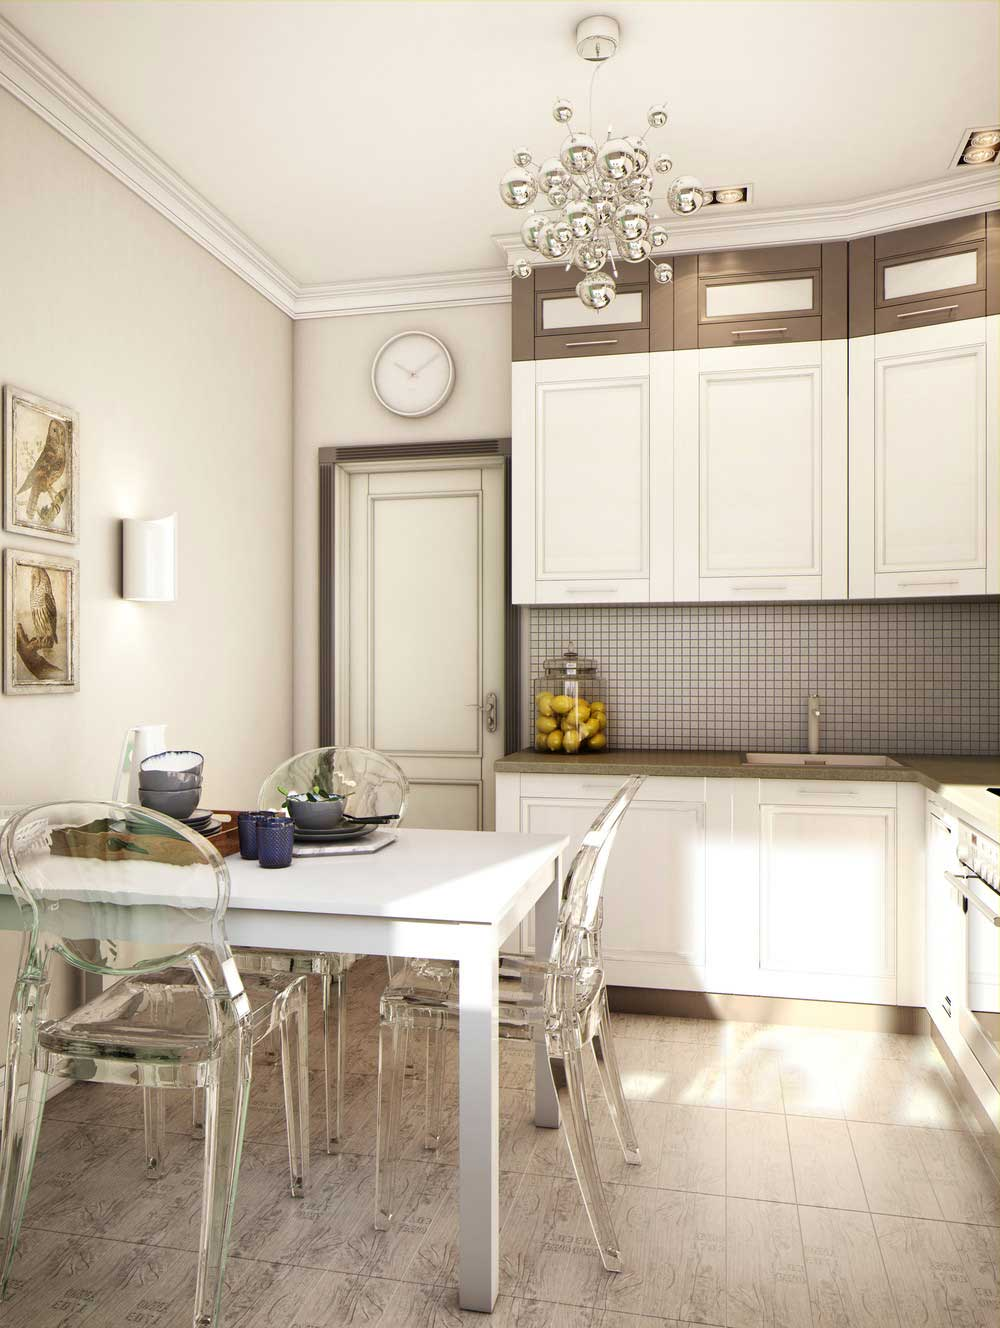 Купить 2-комнатную квартиру по адресу c Ромашково, пр-д